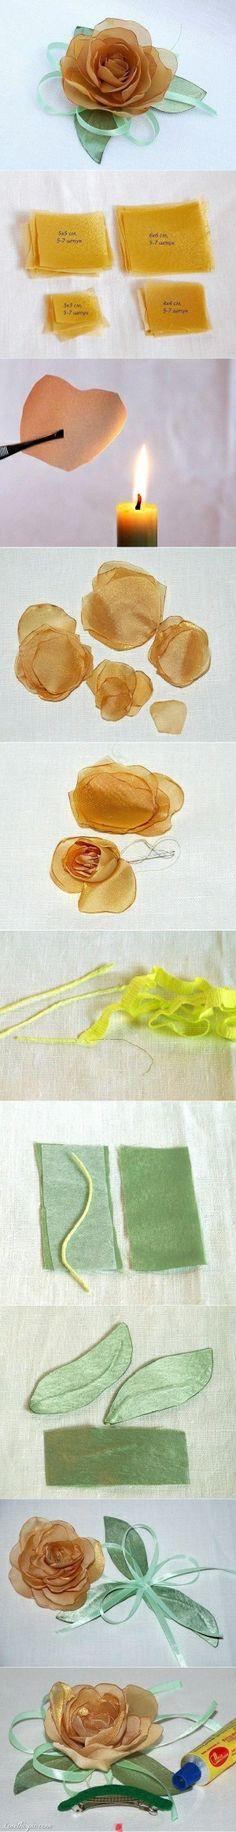 #fabric-flower